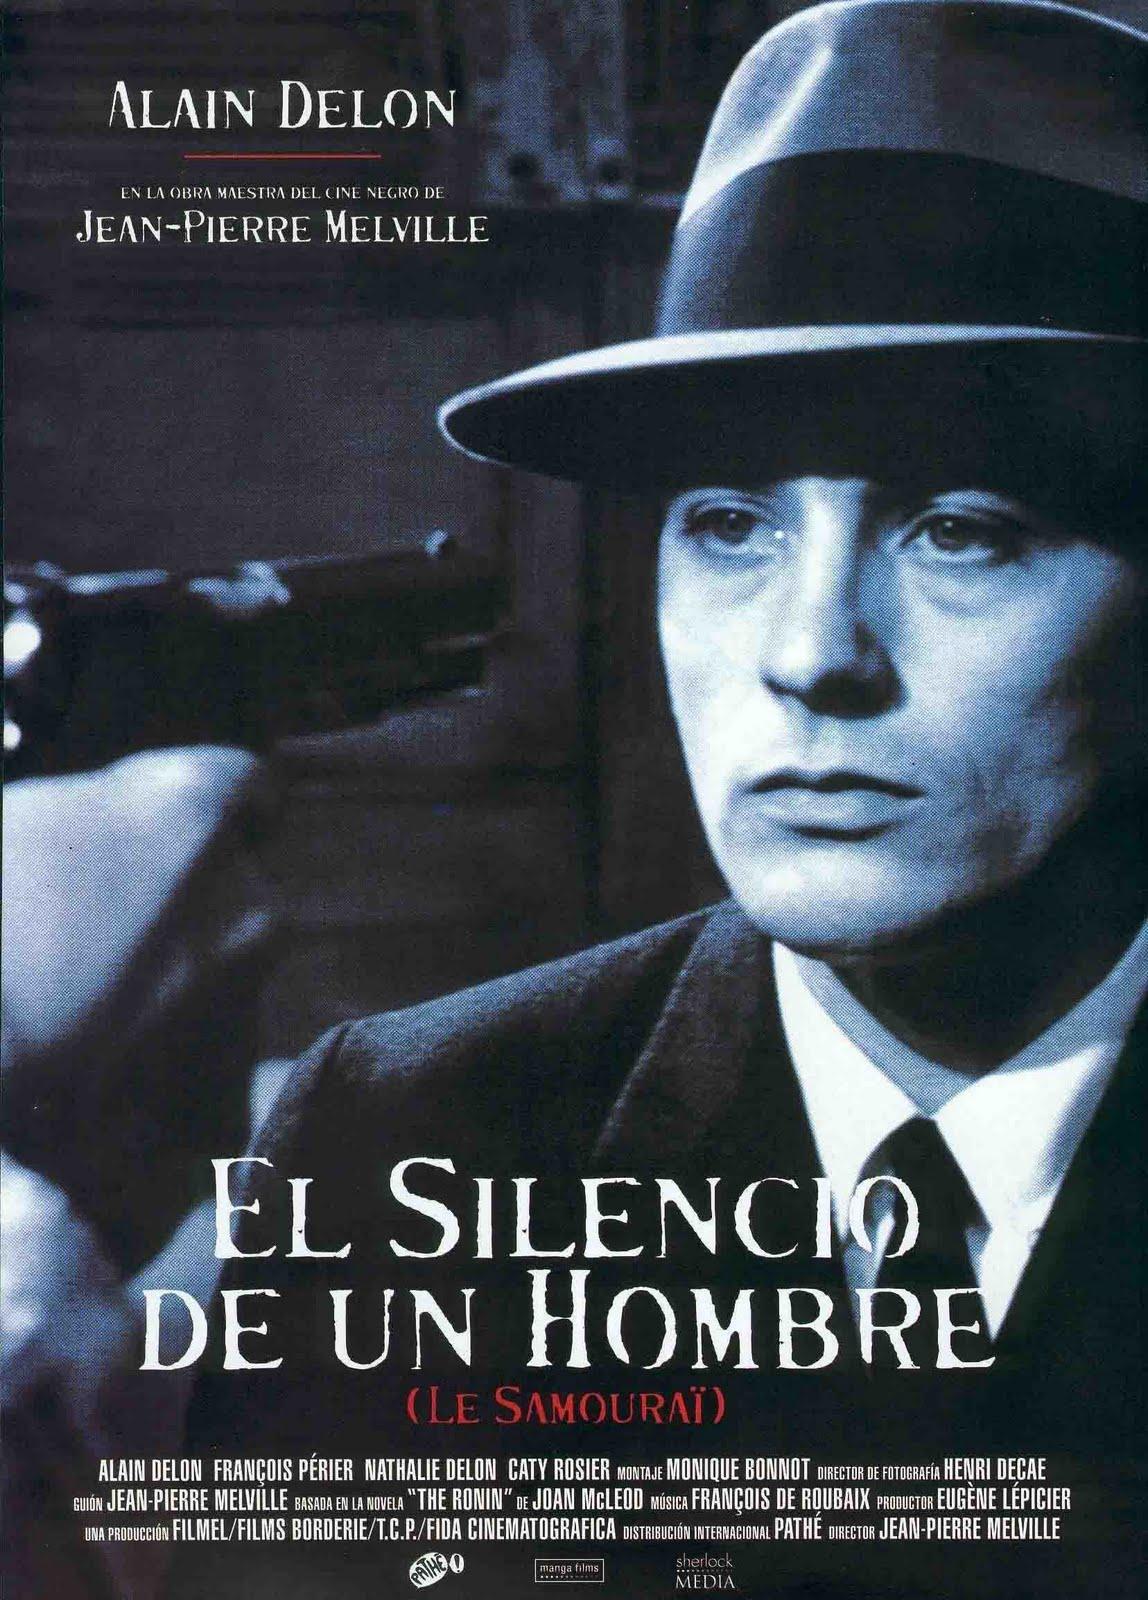 http://3.bp.blogspot.com/_t2NLf0Xf0i4/S_MMJiHjb_I/AAAAAAAAGC8/gR_koxQpdZg/s1600/1967+-+El+silencio+de+un+hombre+-+Le+samoura%C3%AF+-+tt0062229+espanol.jpg